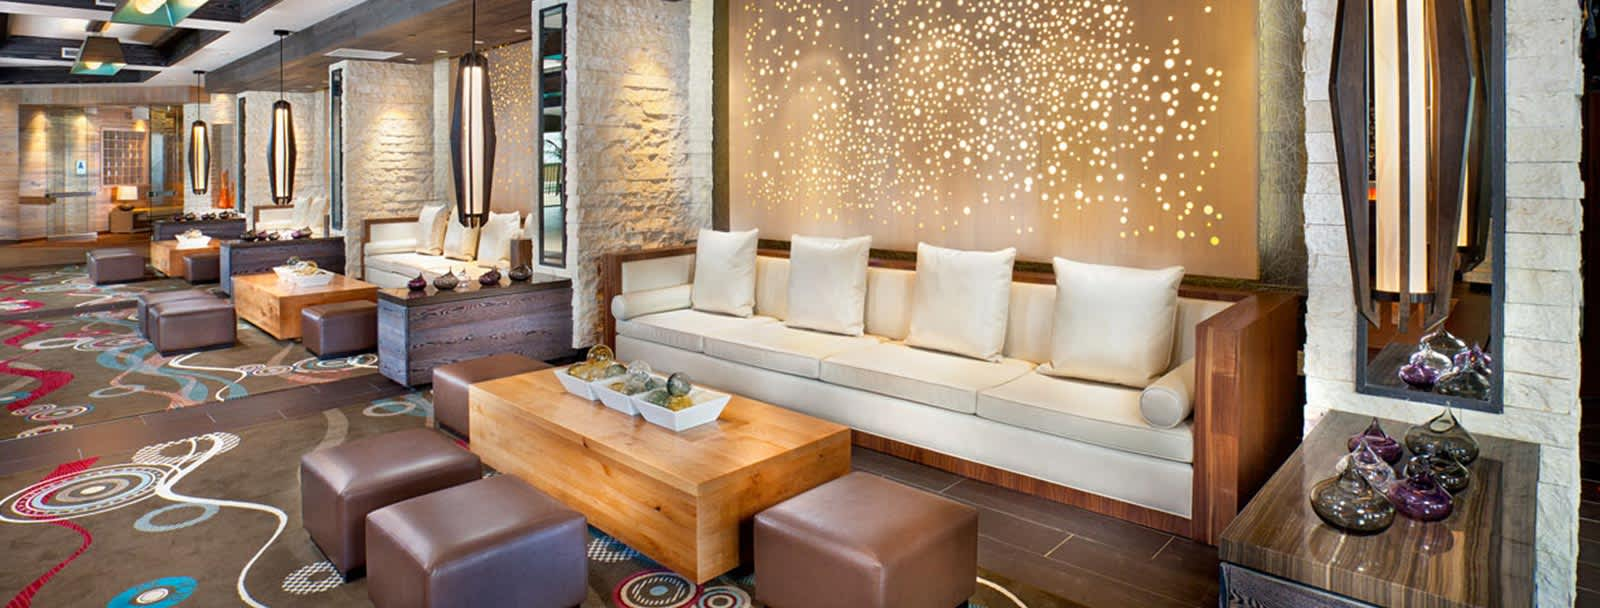 Design & Construction of Davidson Hotels & Resorts, Georgia